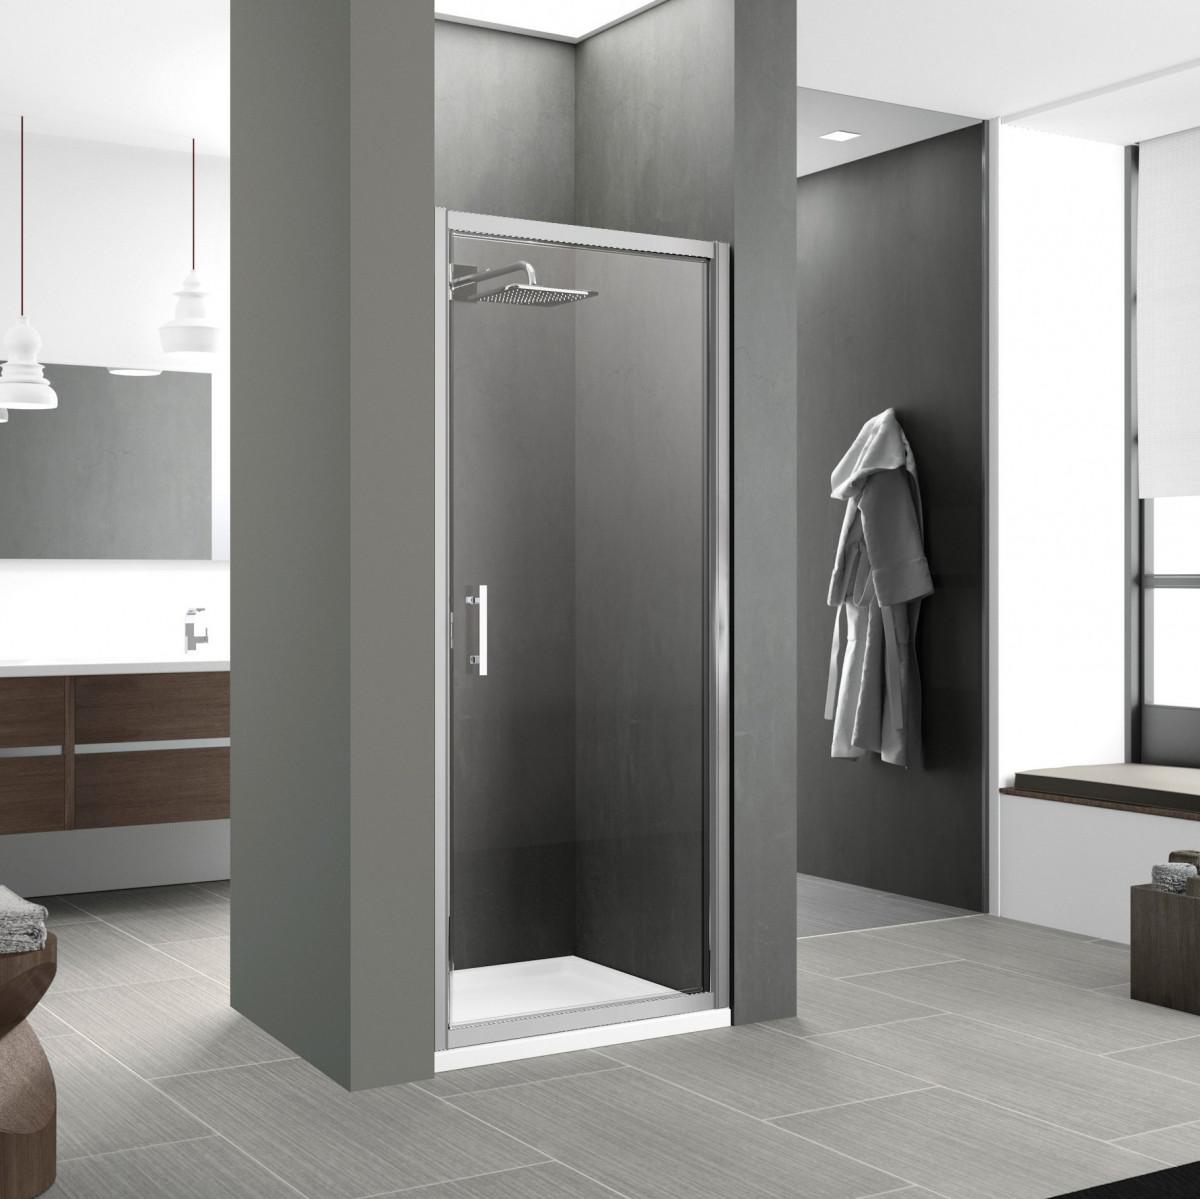 Novellini zephyros g hinged shower door 900mm zephyrg861k for Novellini shower doors